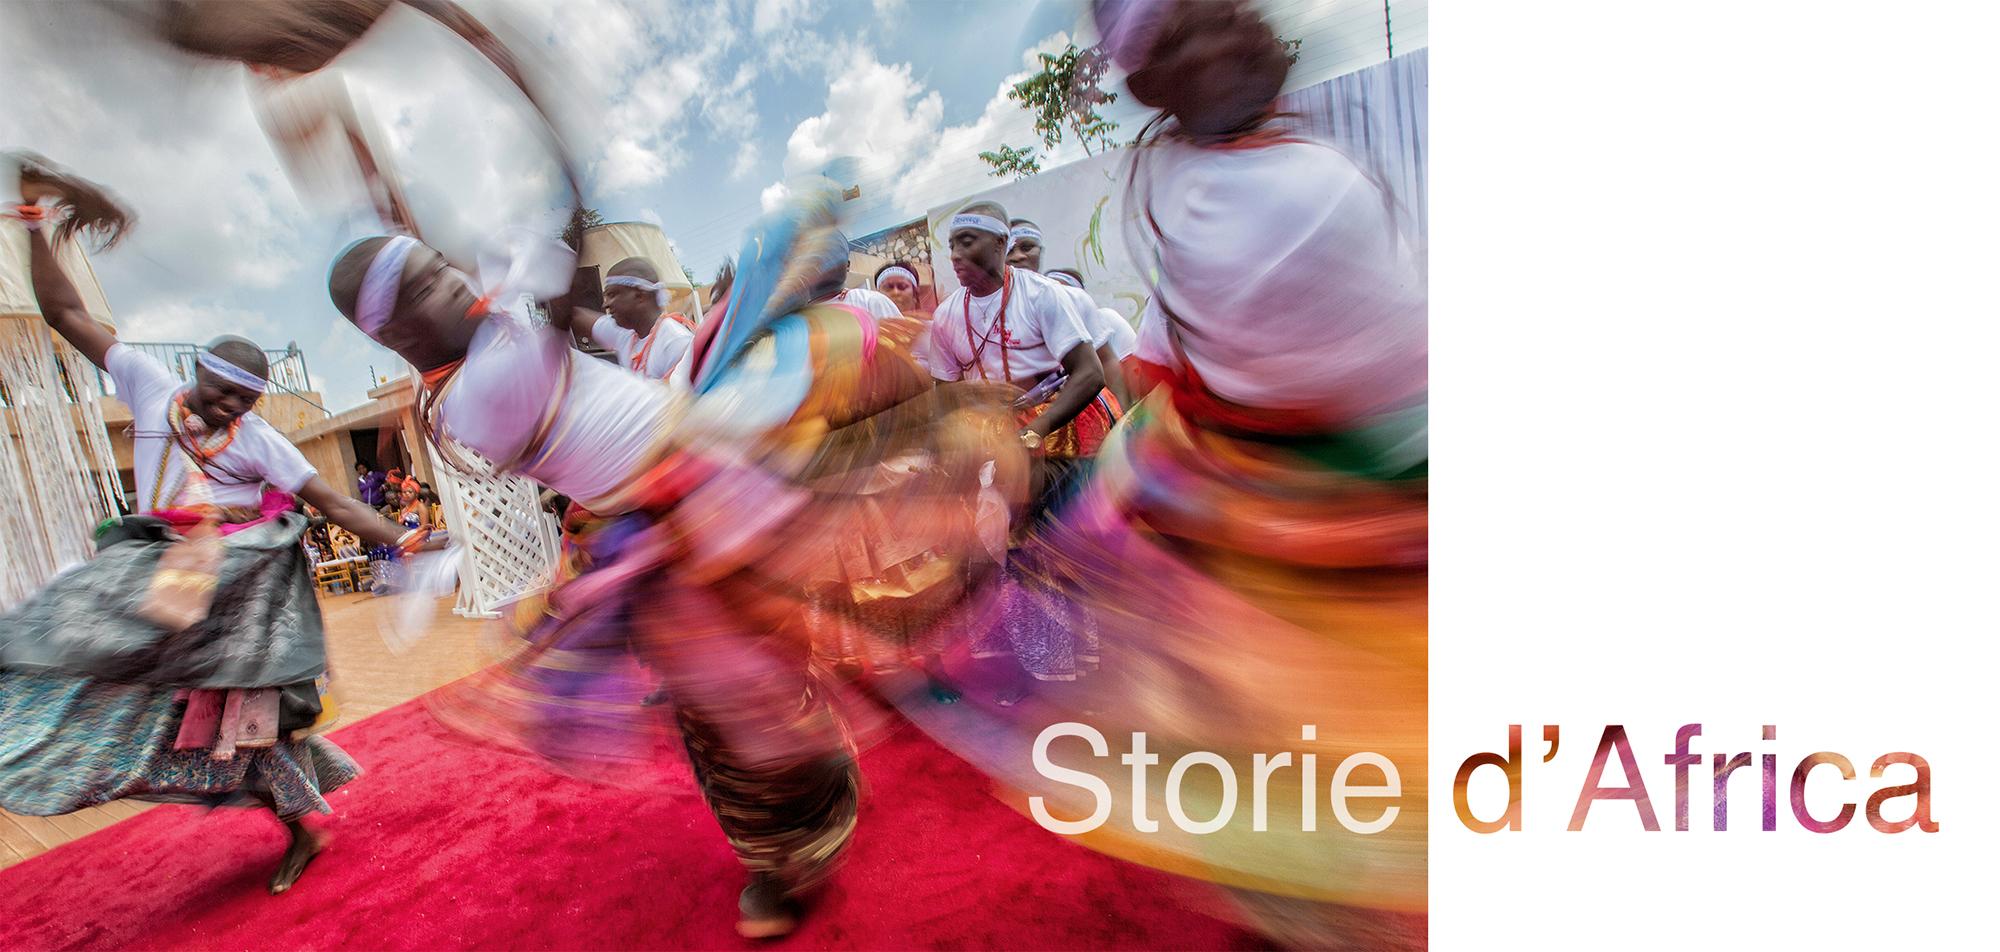 Storie d'Africa Exhibition.jpg